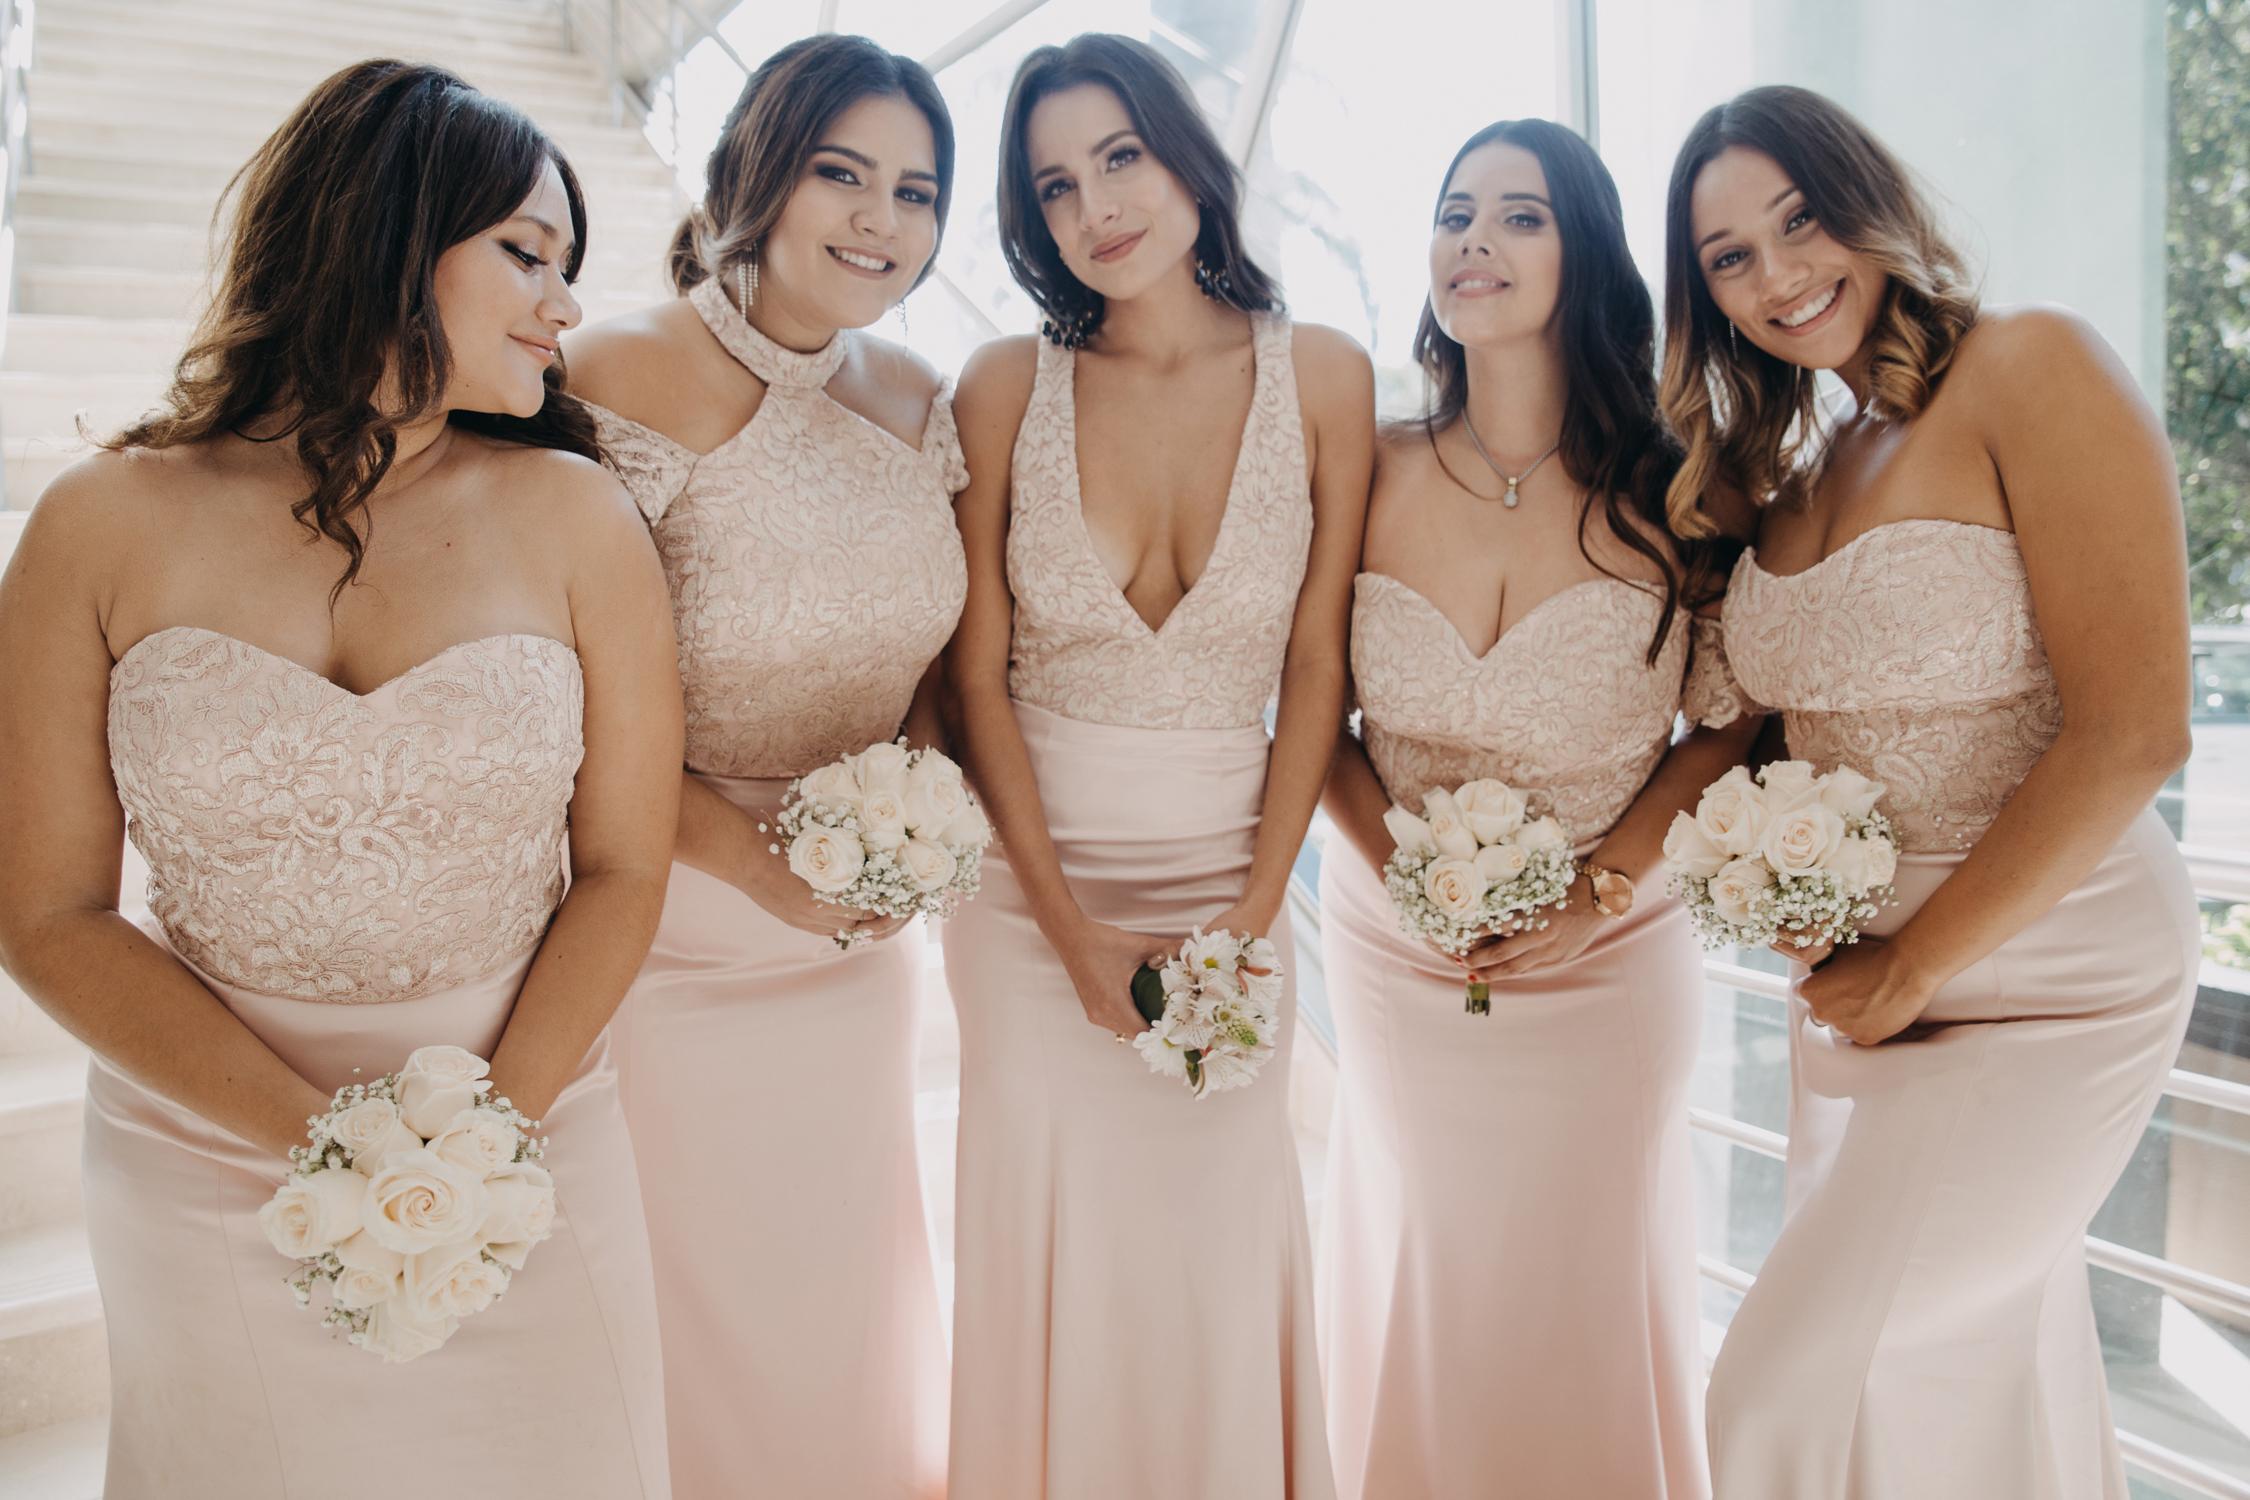 Michelle-Agurto-Fotografia-Bodas-Ecuador-Destination-Wedding-Photographer-Daniela-Dirk-98.JPG